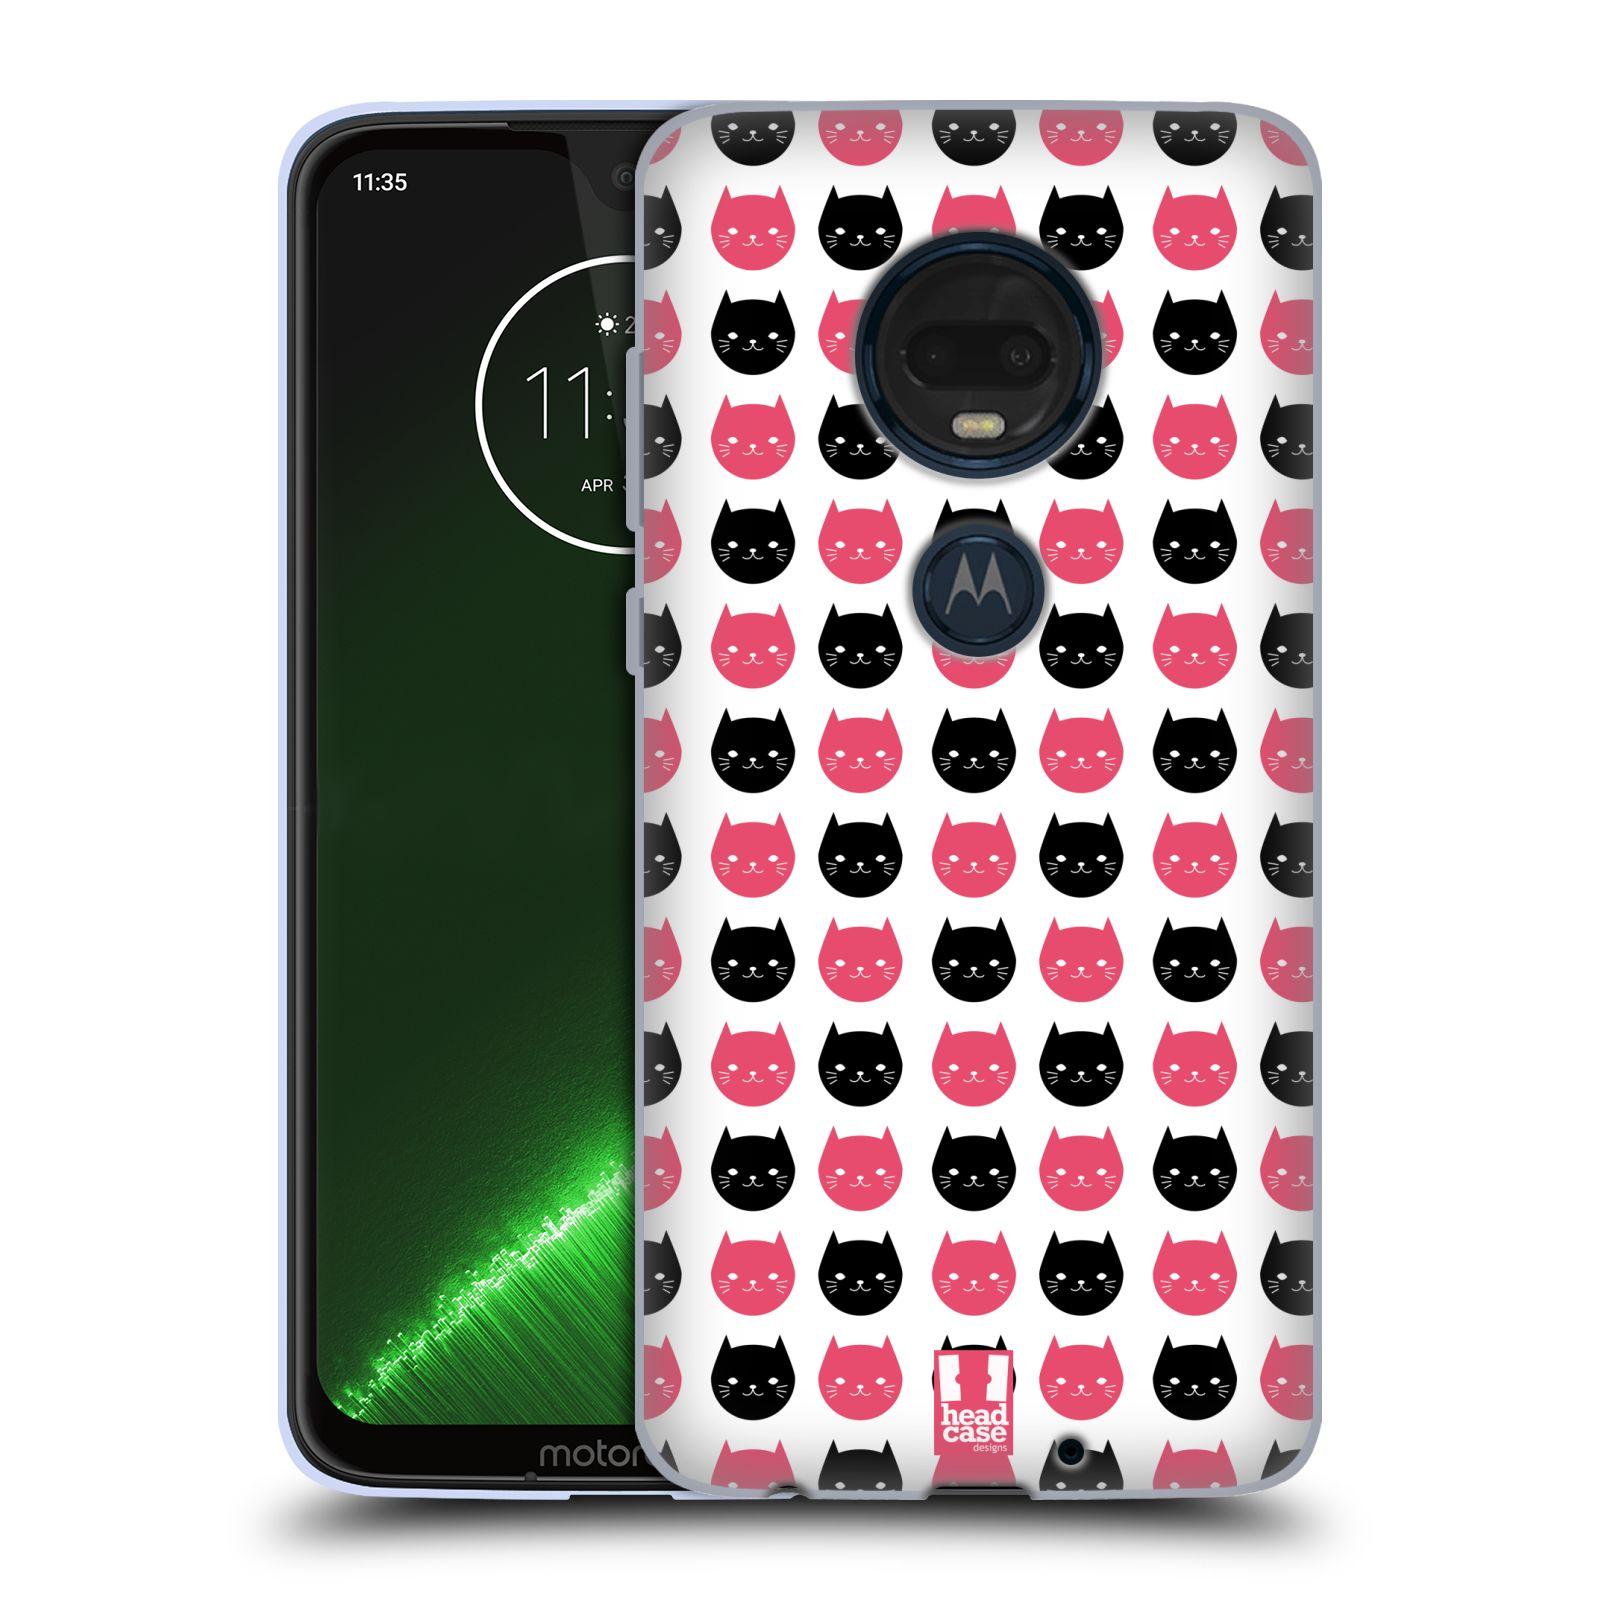 Silikonové pouzdro na mobil Motorola Moto G7 Plus - Head Case - KOČKY Black and Pink